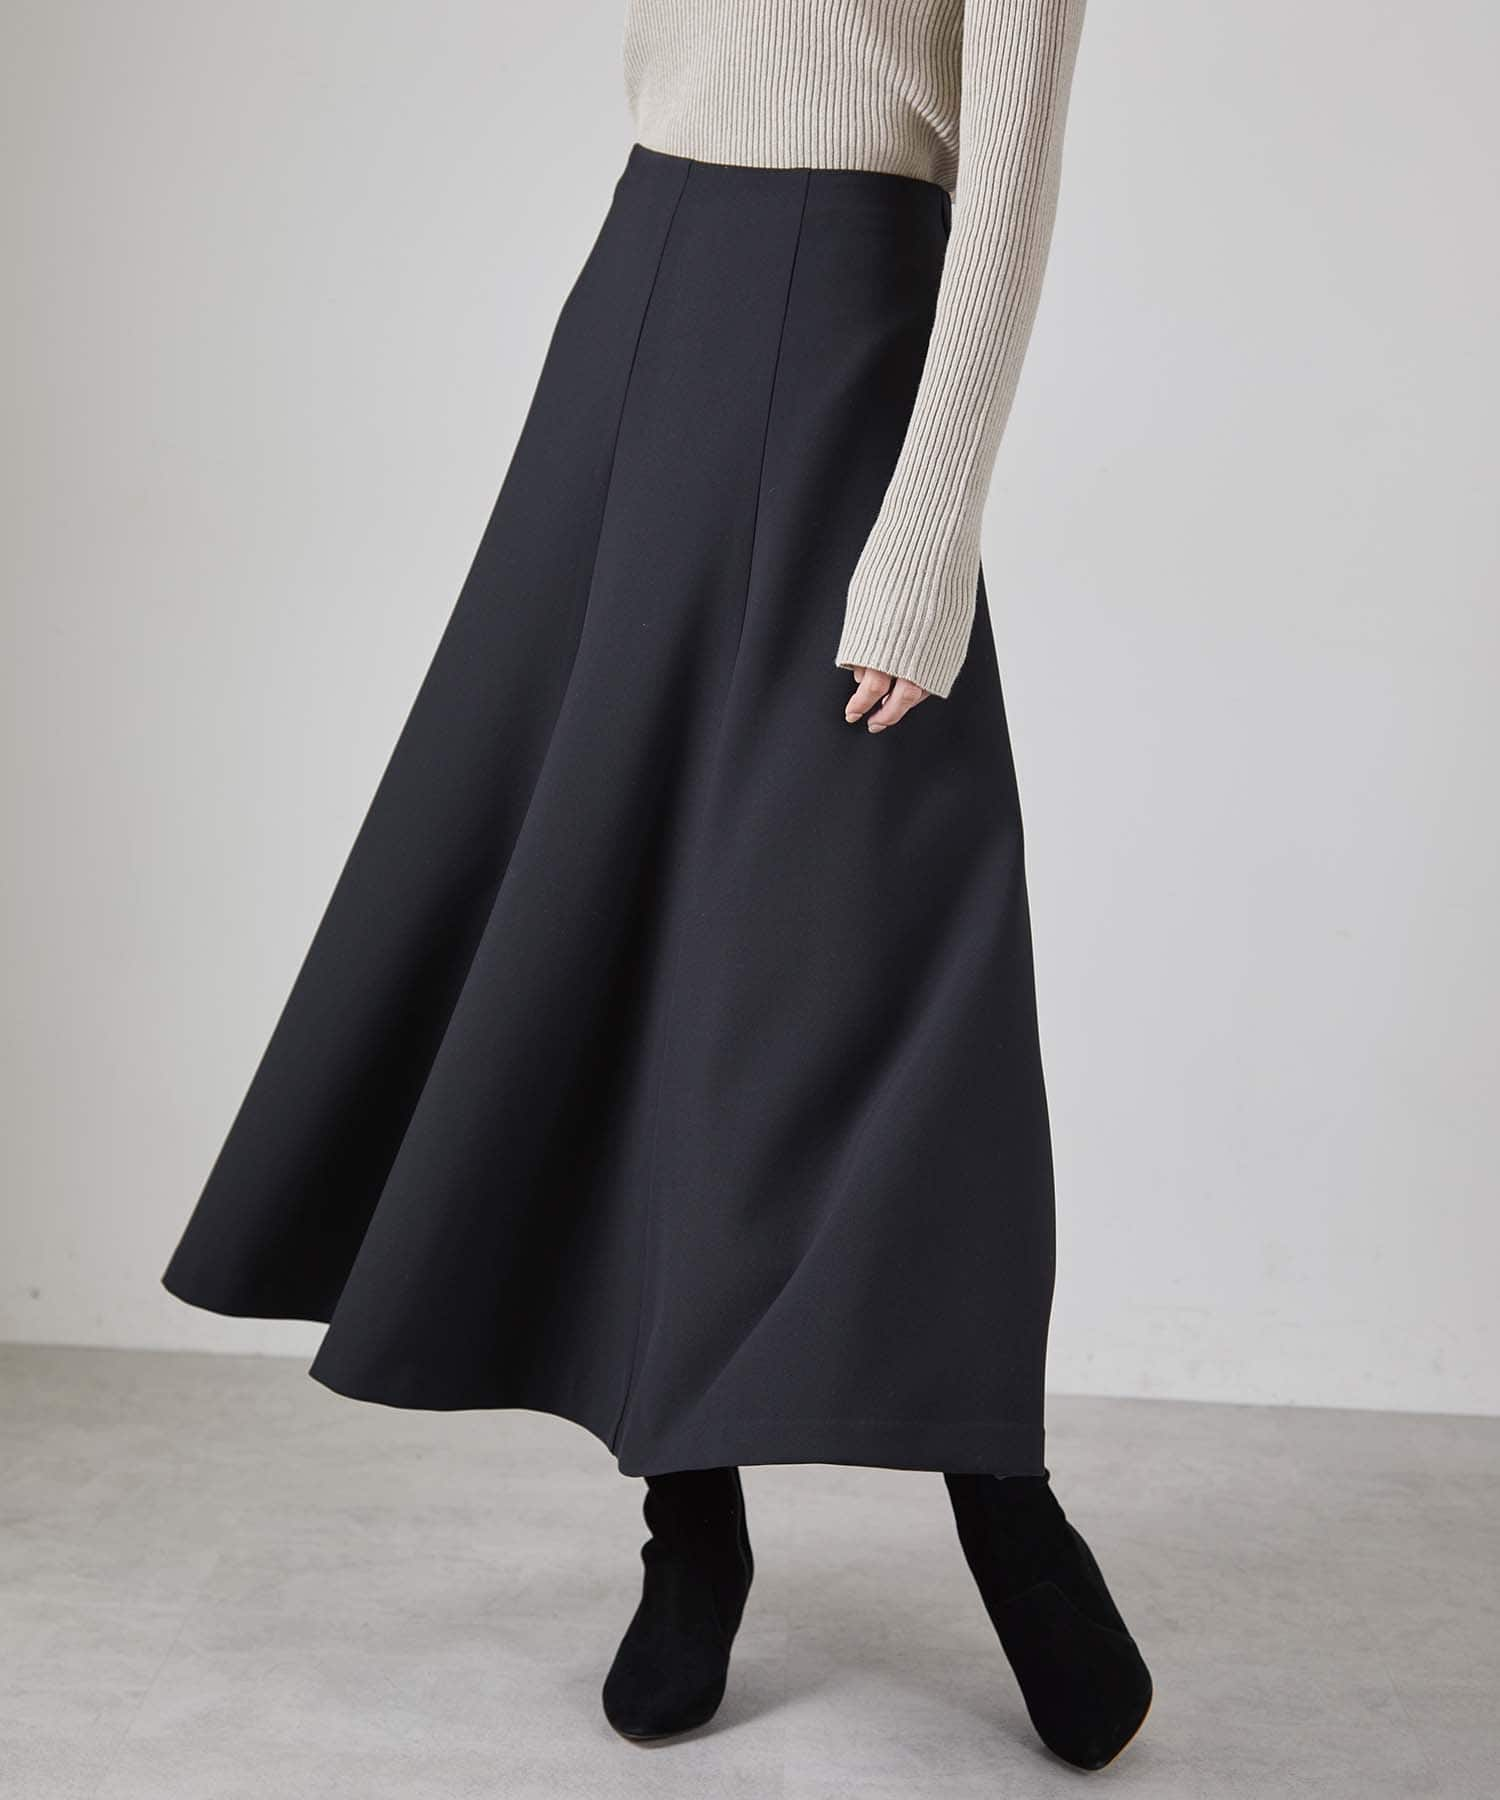 OUVRAGE CLASSE(ウヴラージュクラス) レディース ダブルクロス切替フレアスカート ブラック